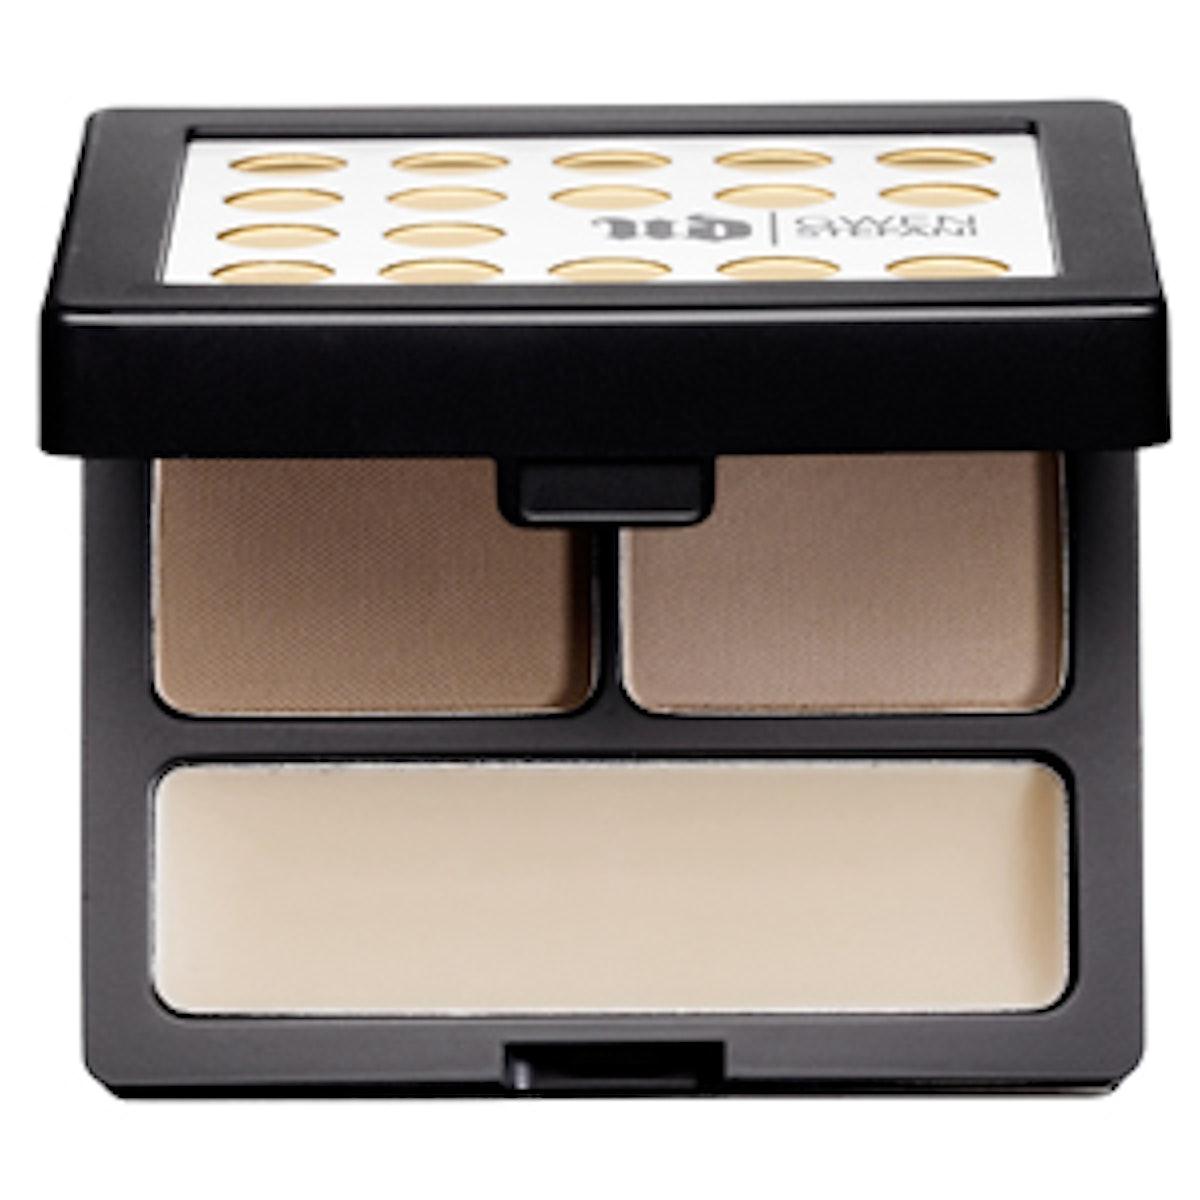 UD Gwen Stefani Brow Box